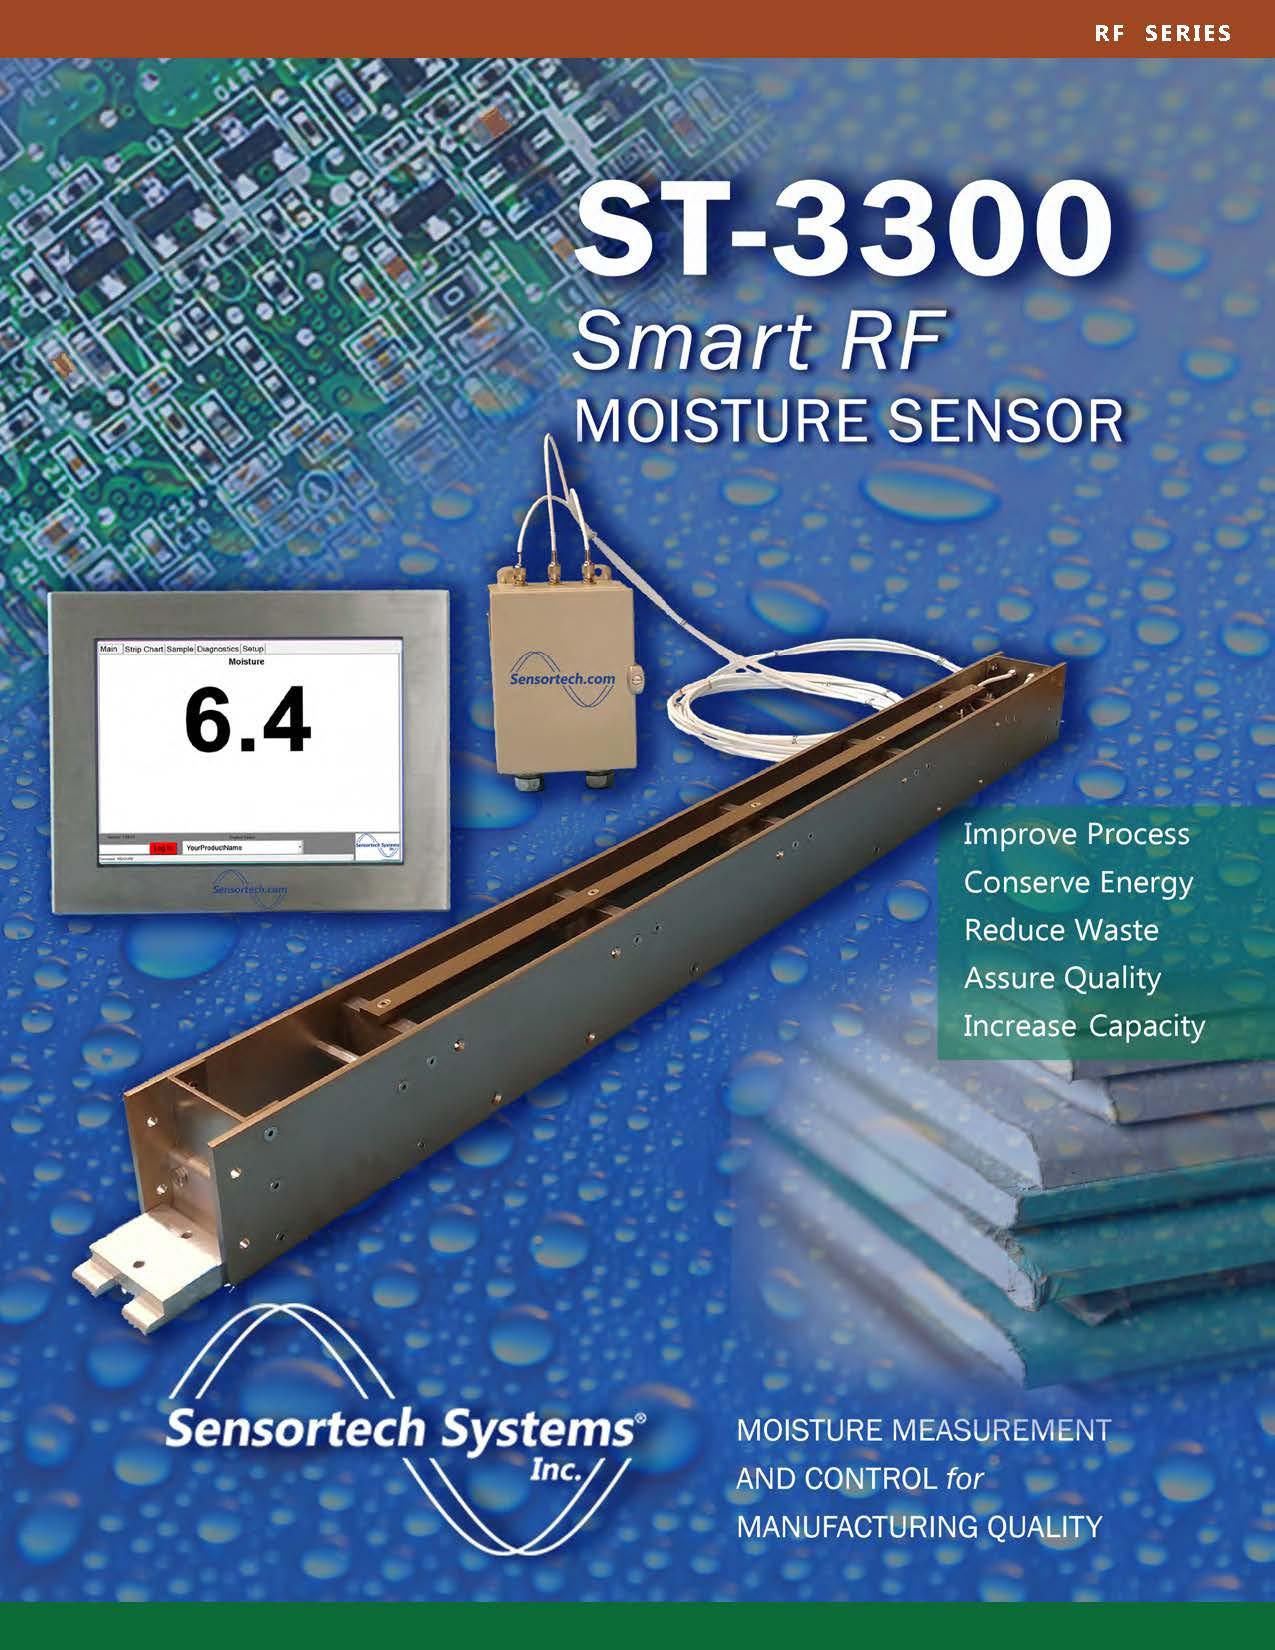 ST-3300 Smart RF Sensor Brochure